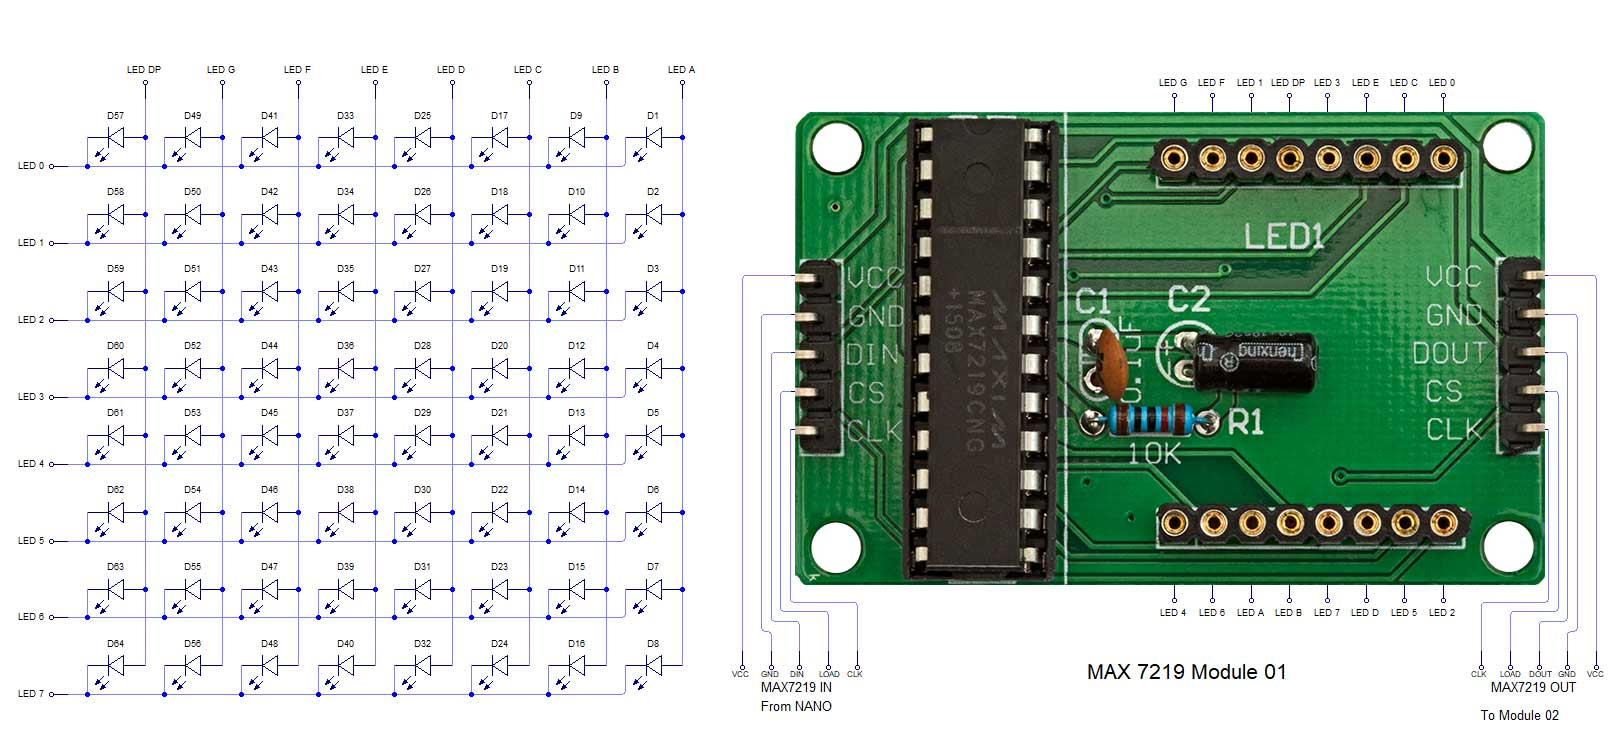 Schmatic mod01 6i7xgf11wu